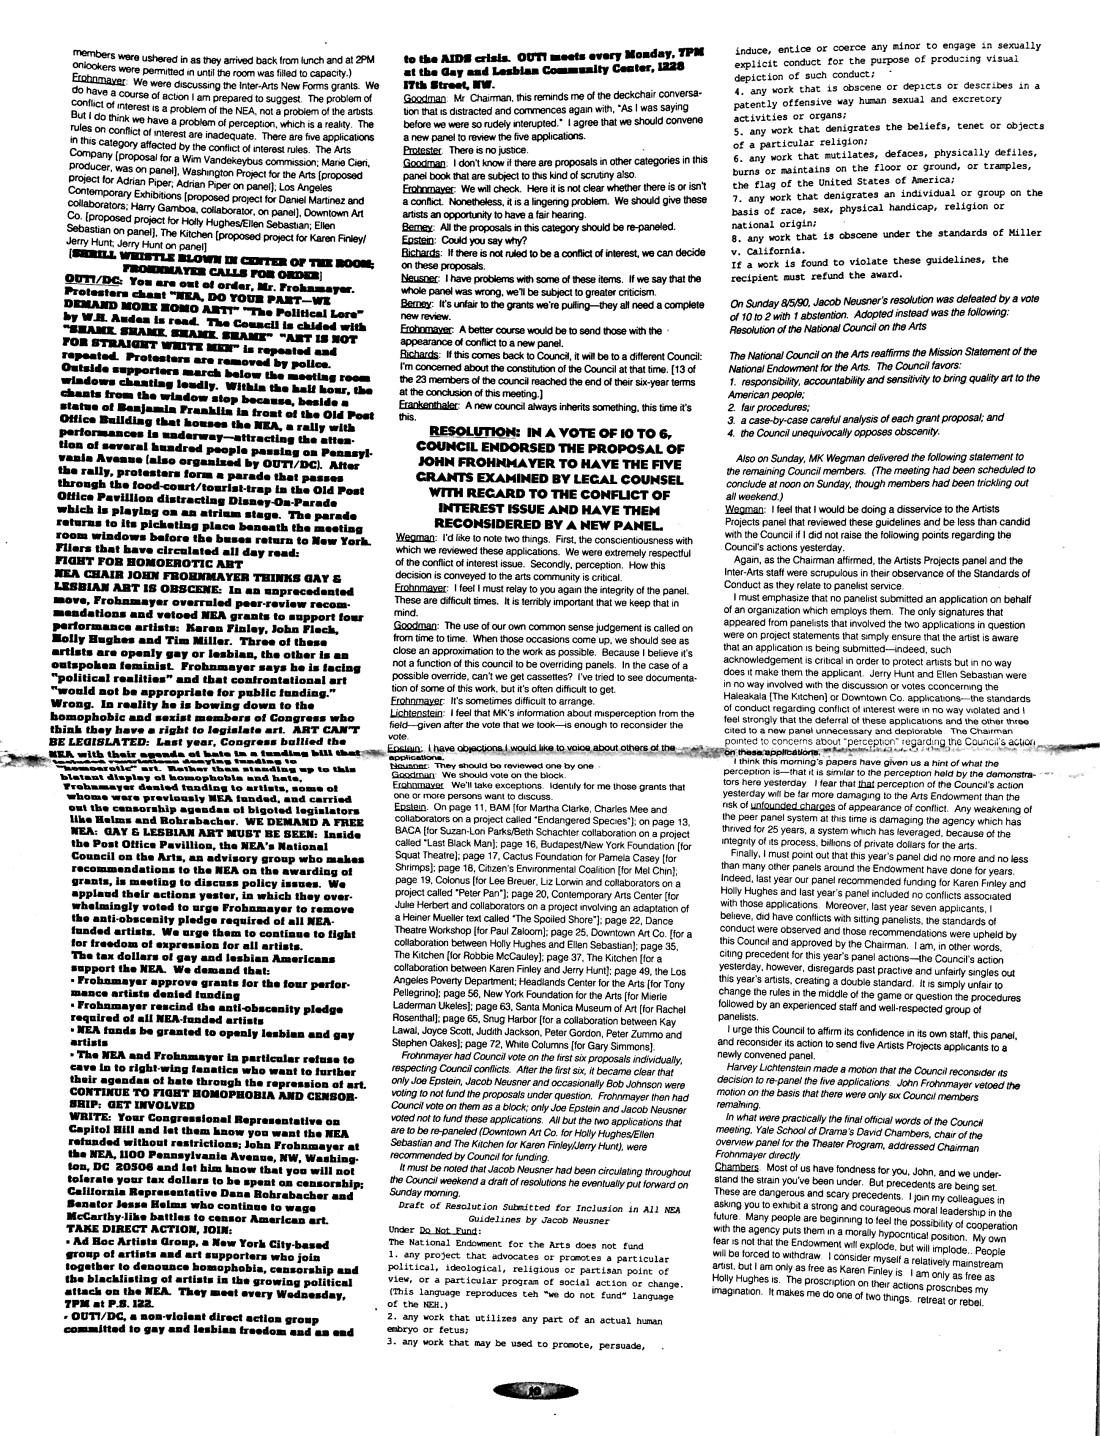 Summer 1990 - NAAO Bulletin Page 10.jpg